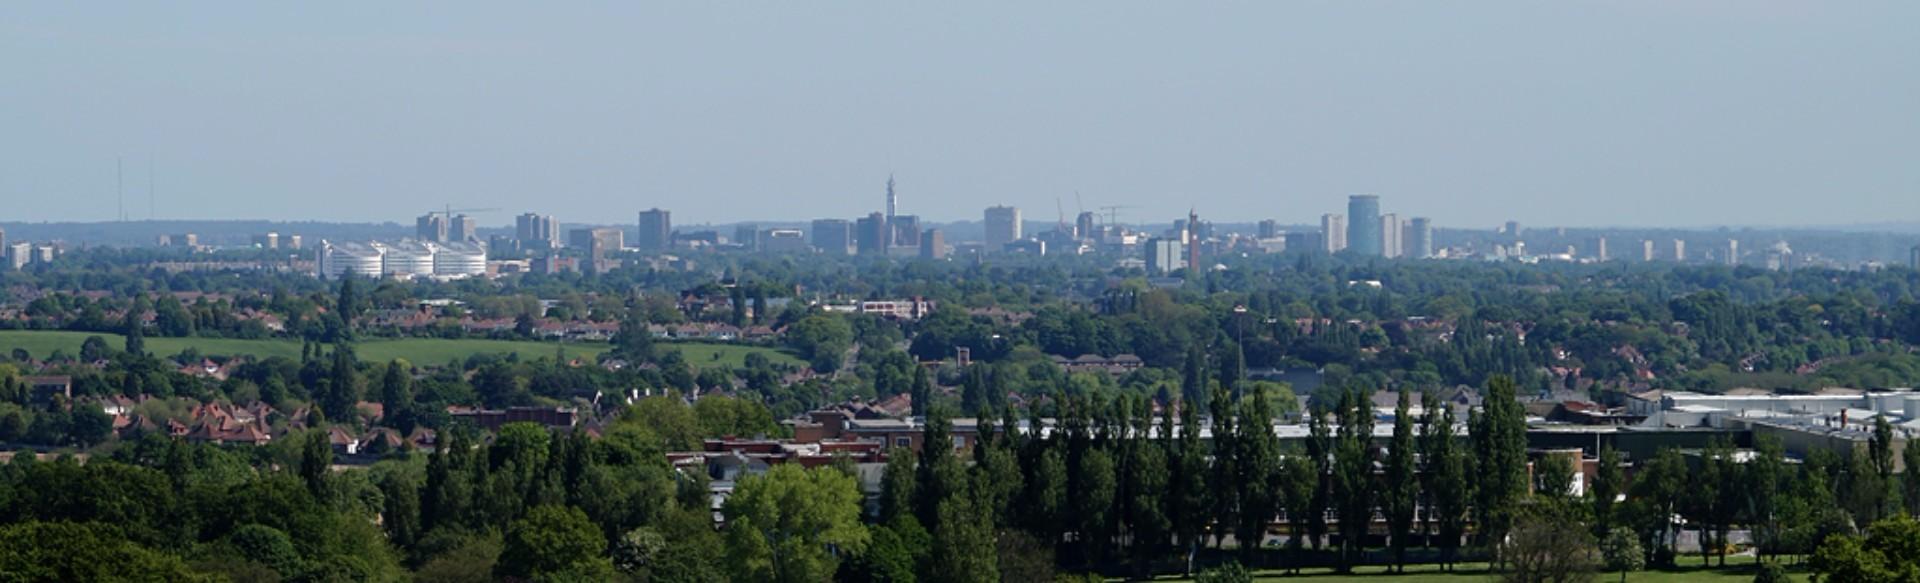 Birmingham Population in 2017